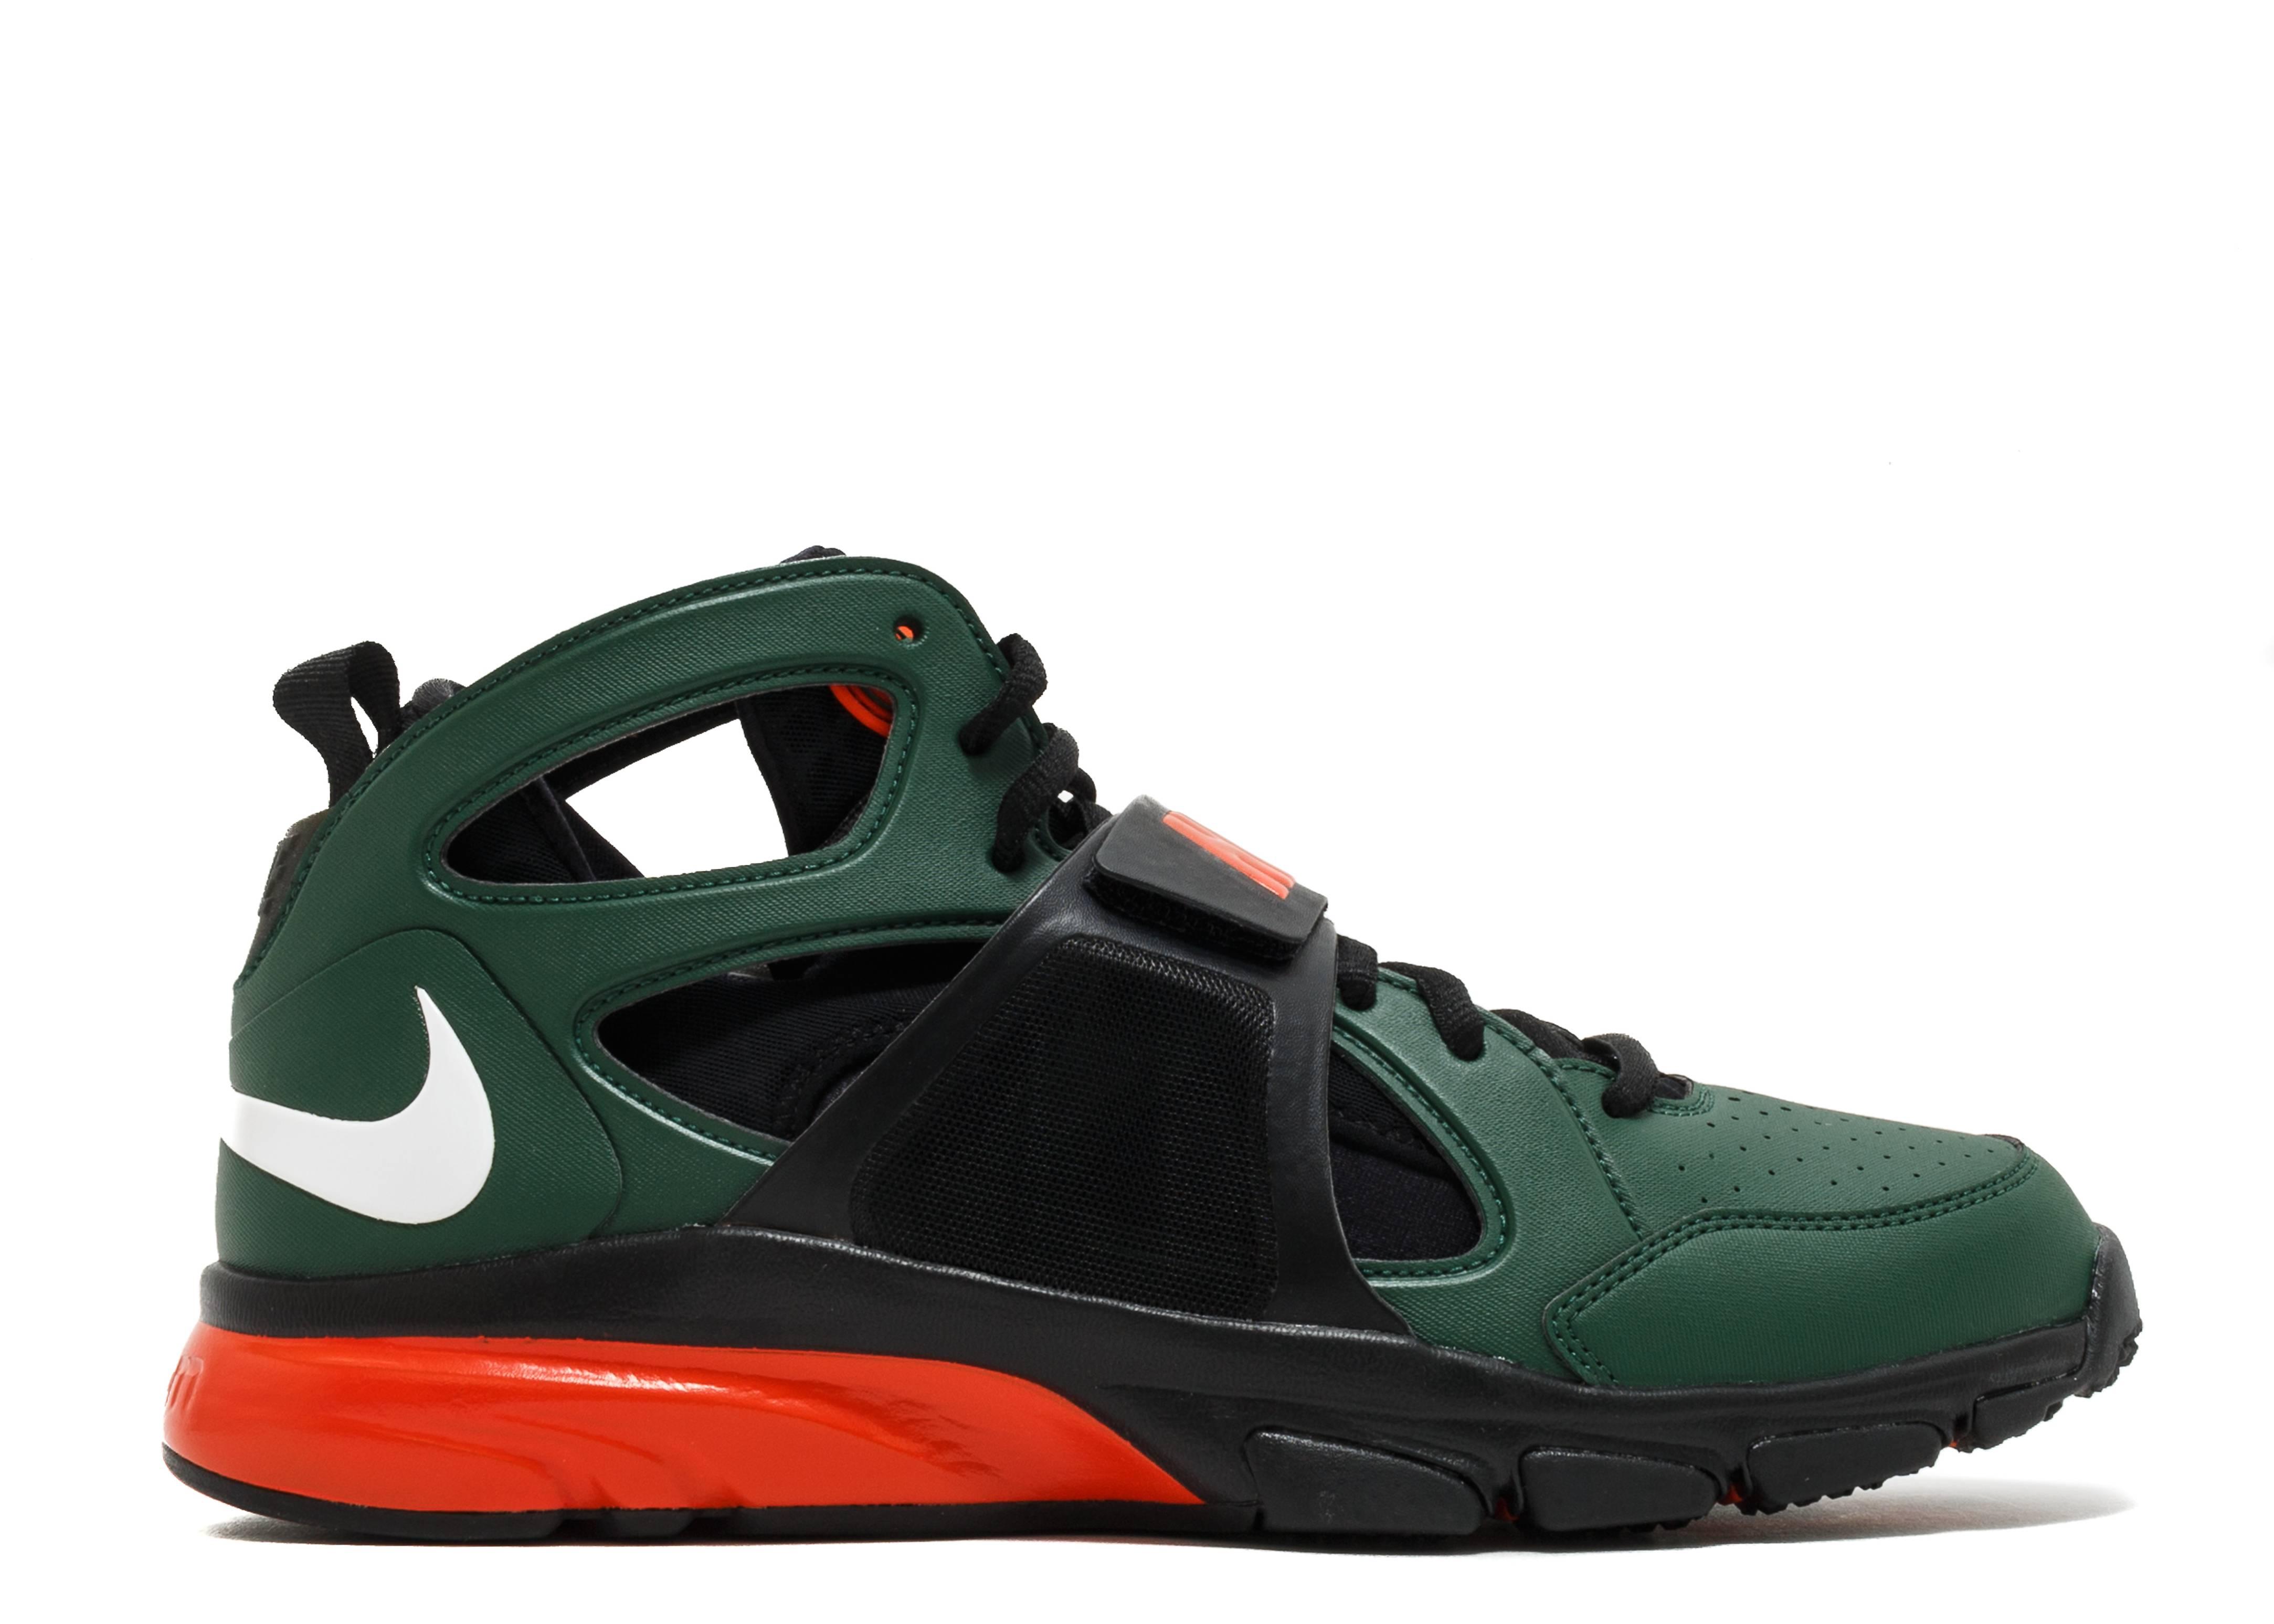 84d6b98ab Nike Zoom Huarache Tr